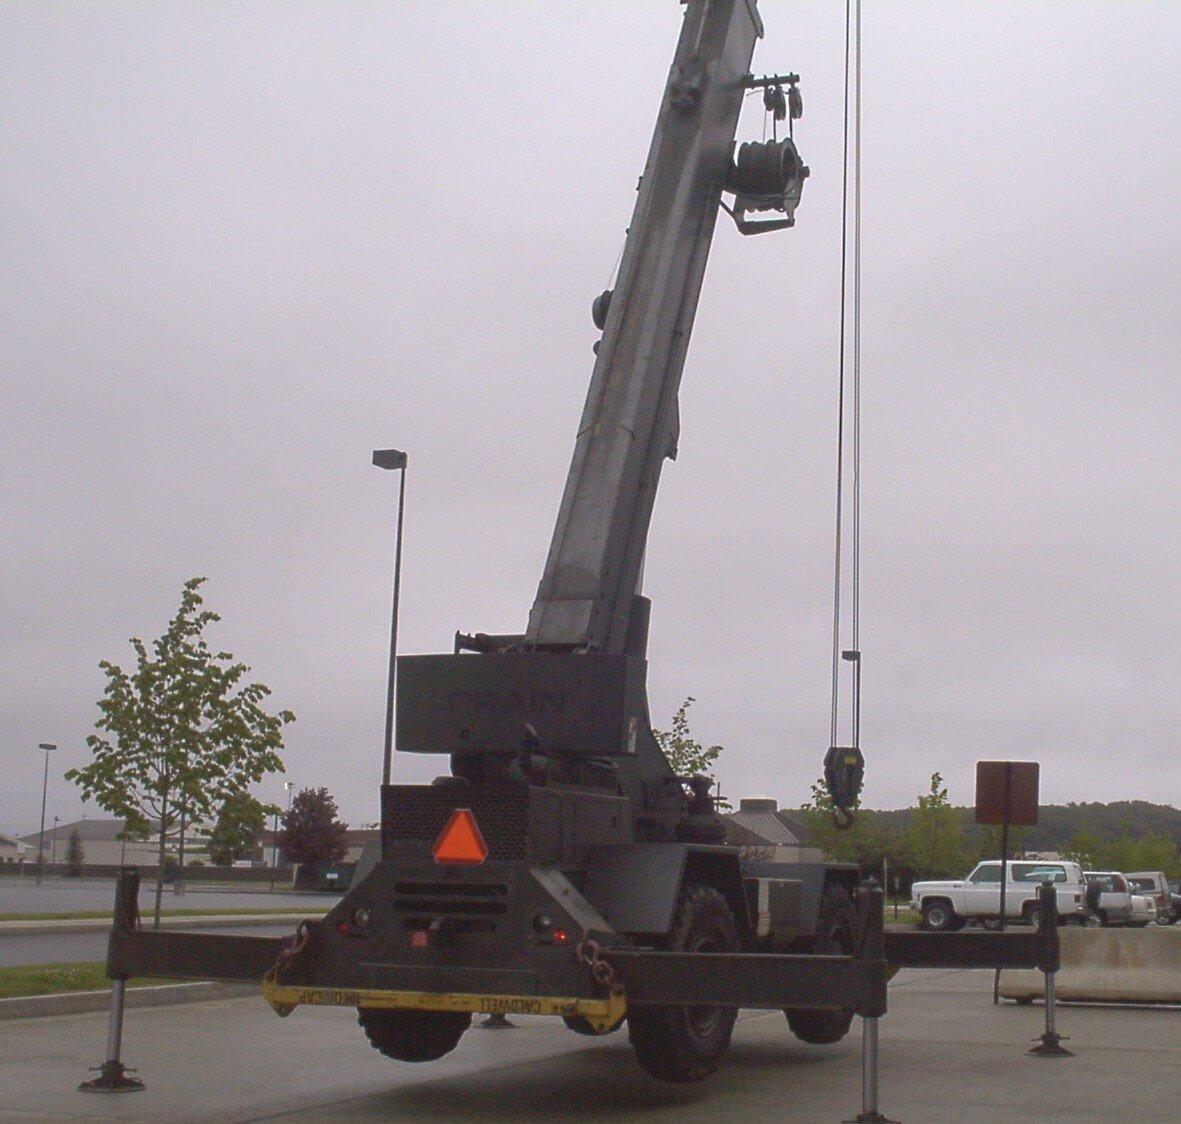 Inspecting a 15 Ton Rough Terrain Crane